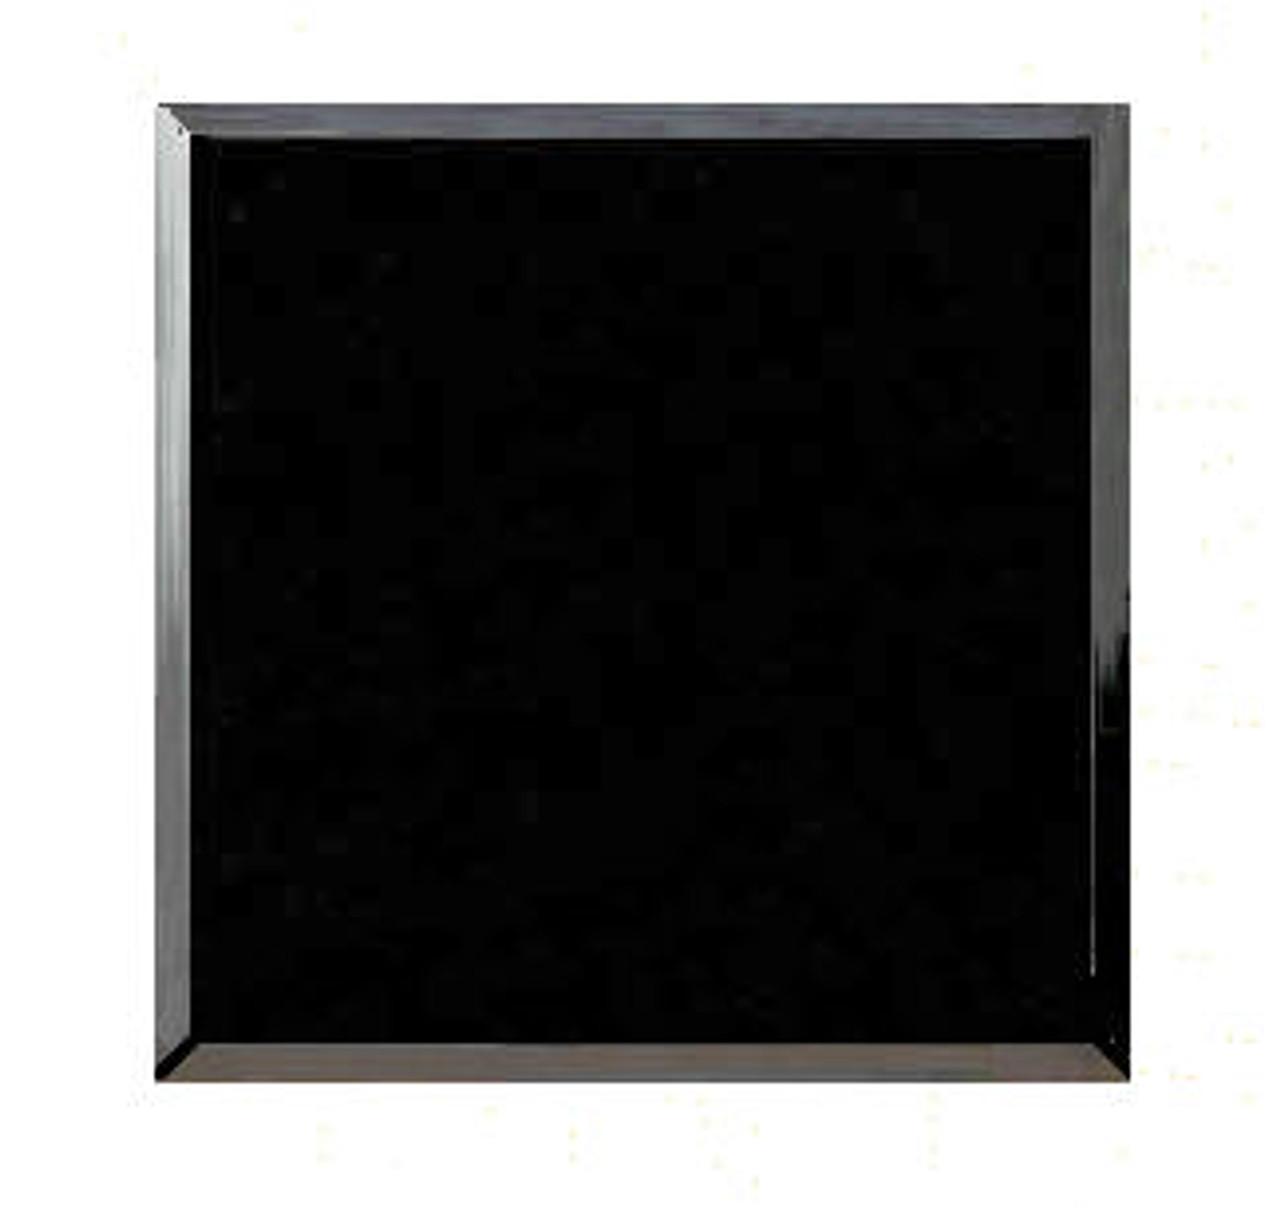 "M-AB-8.5 x 11BEP/:  LaserGrade Absolute Black Marble, 8.5"" x 11"" x 7-8mmEP,  Beveled, Edges Polished,  (5F) - Case of 10"